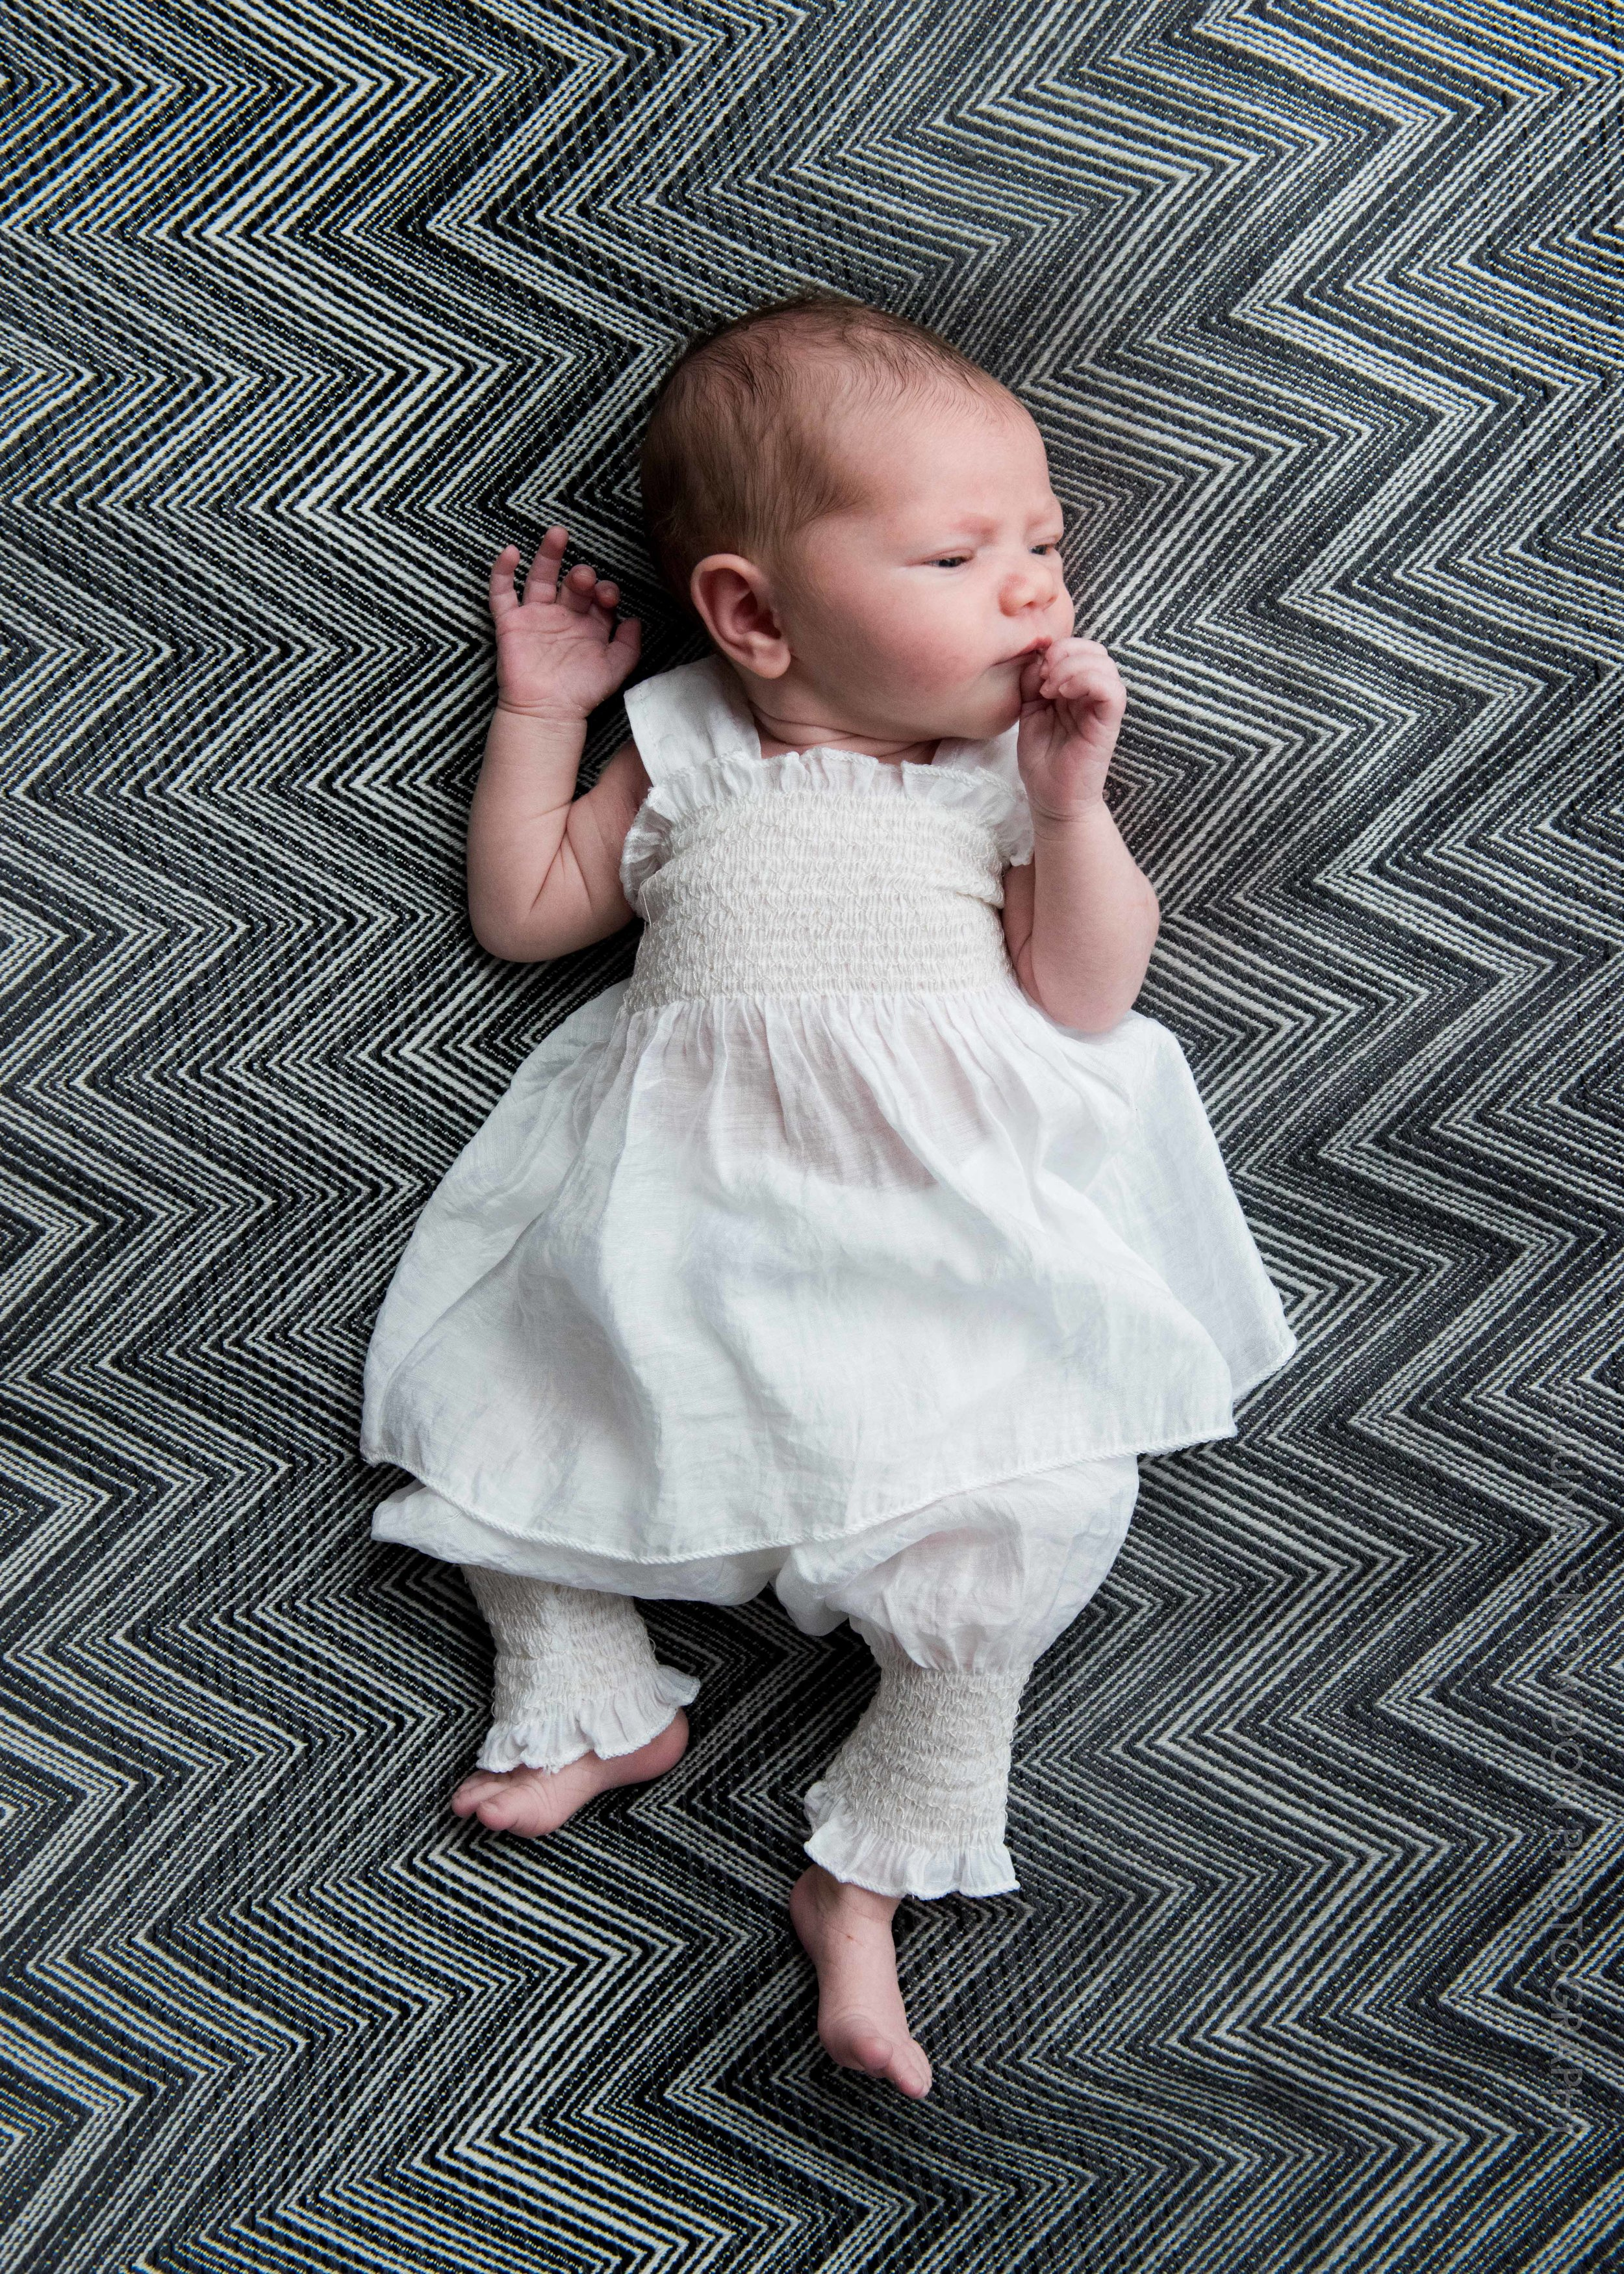 juno-snowdon-photography-newborn-portrait-6991.jpg